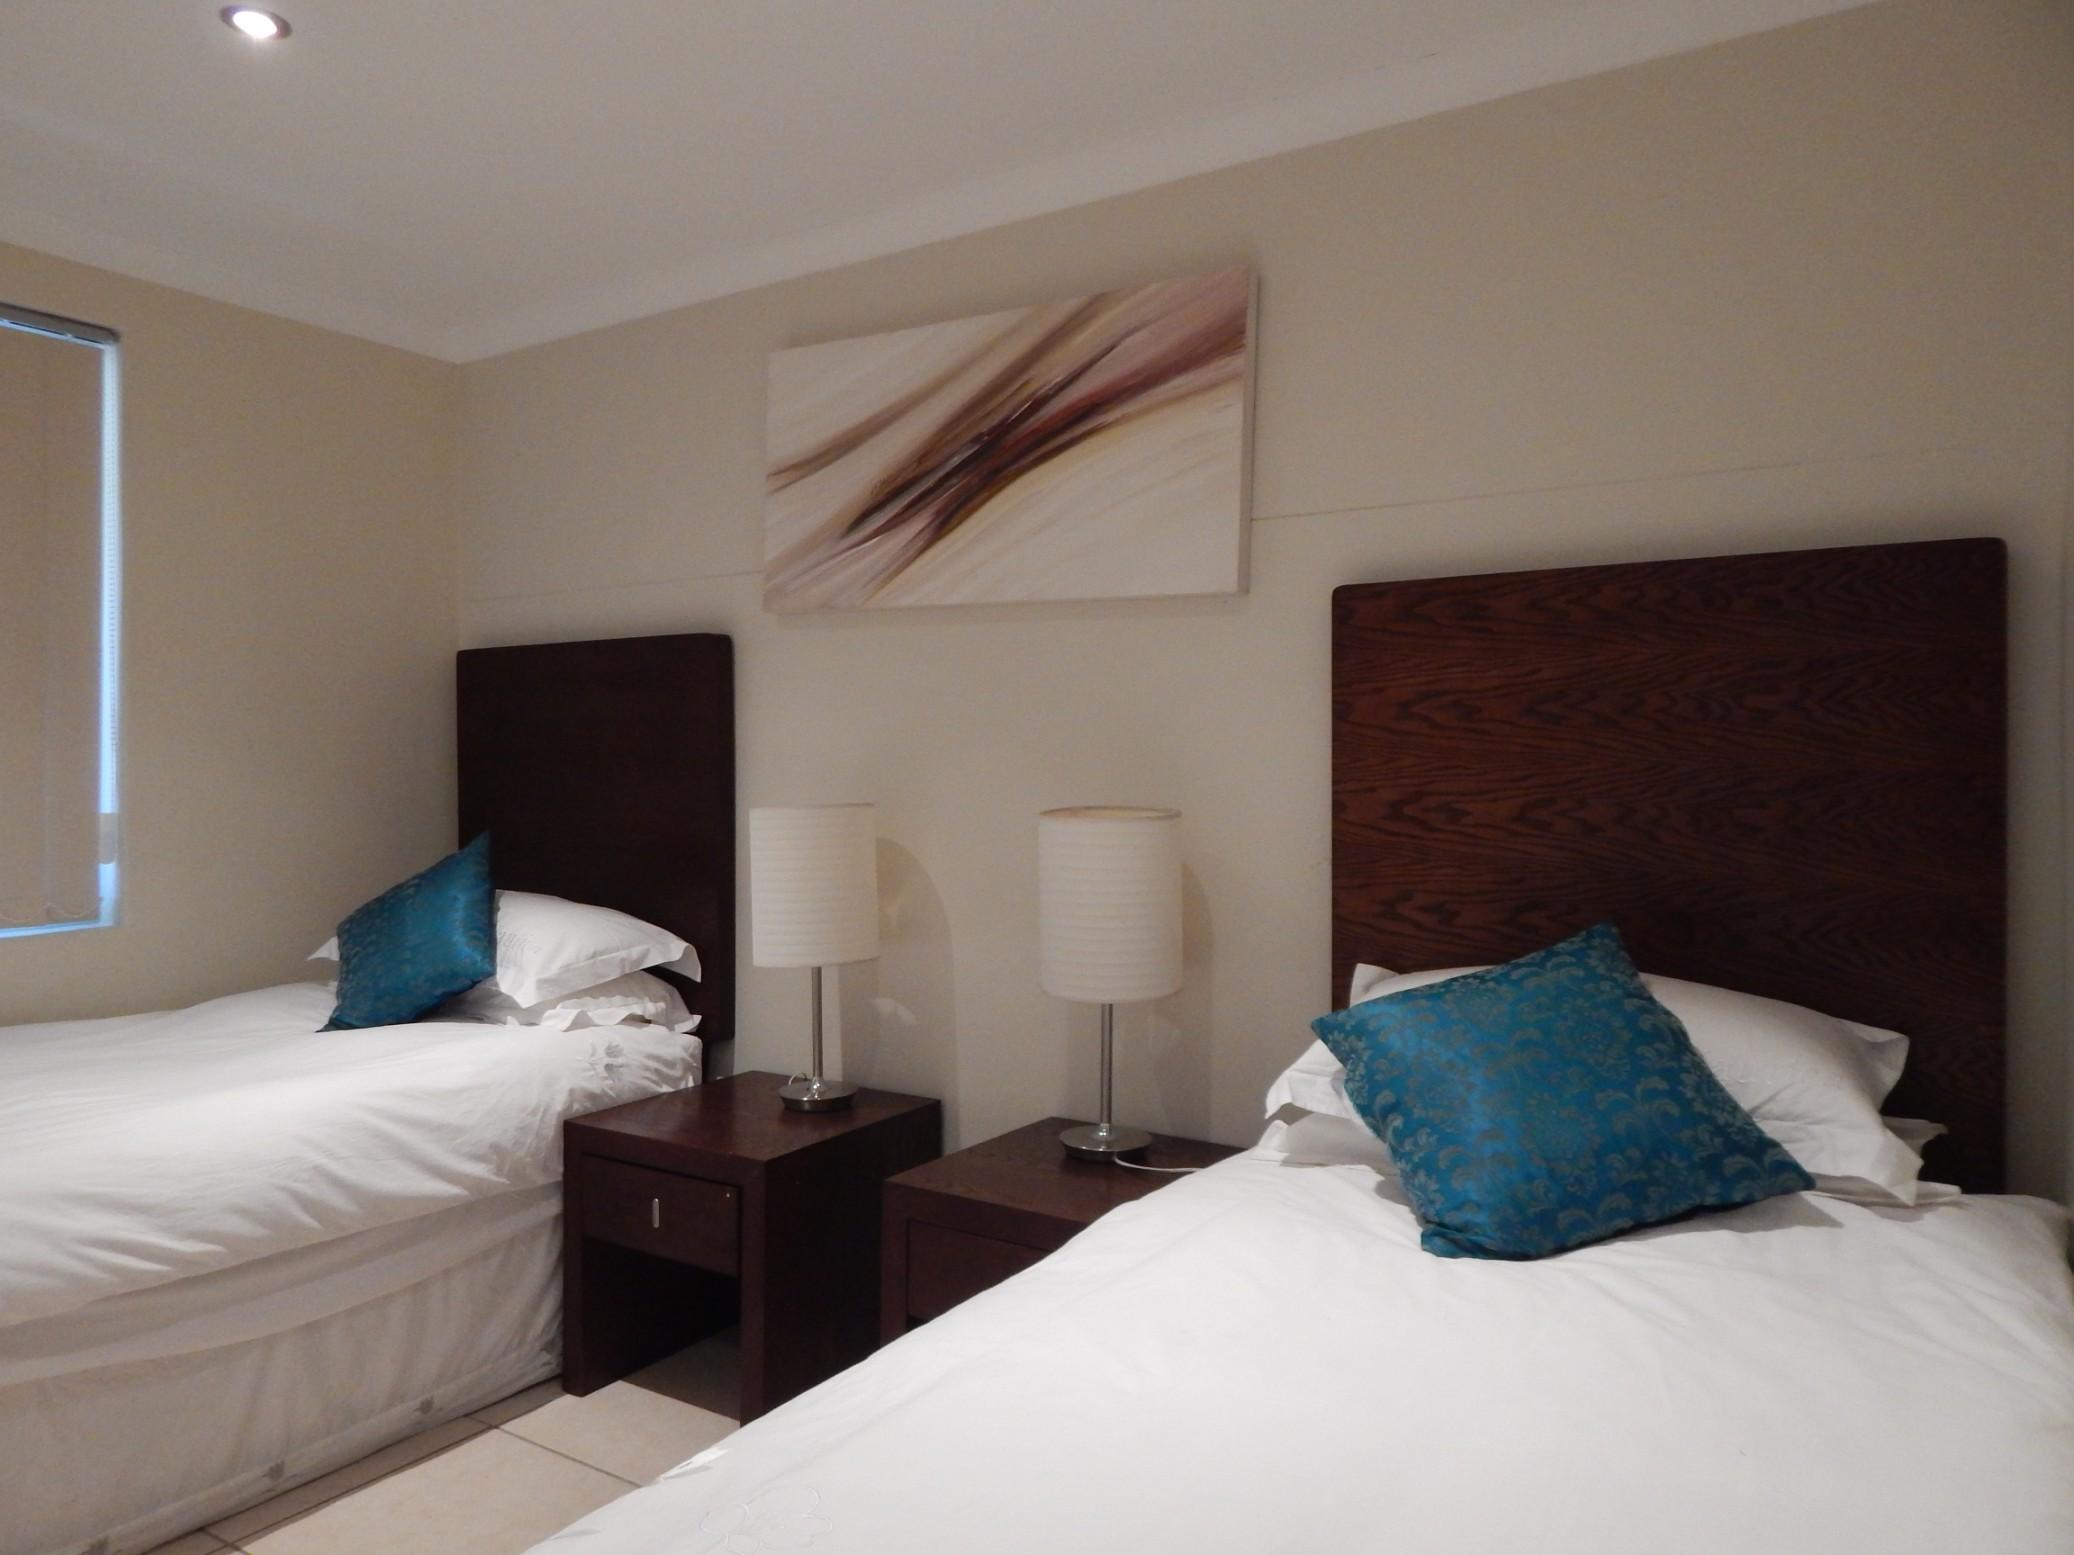 2 Bedroom Apartment for sale in De Bakke ENT0067862 : photo#11